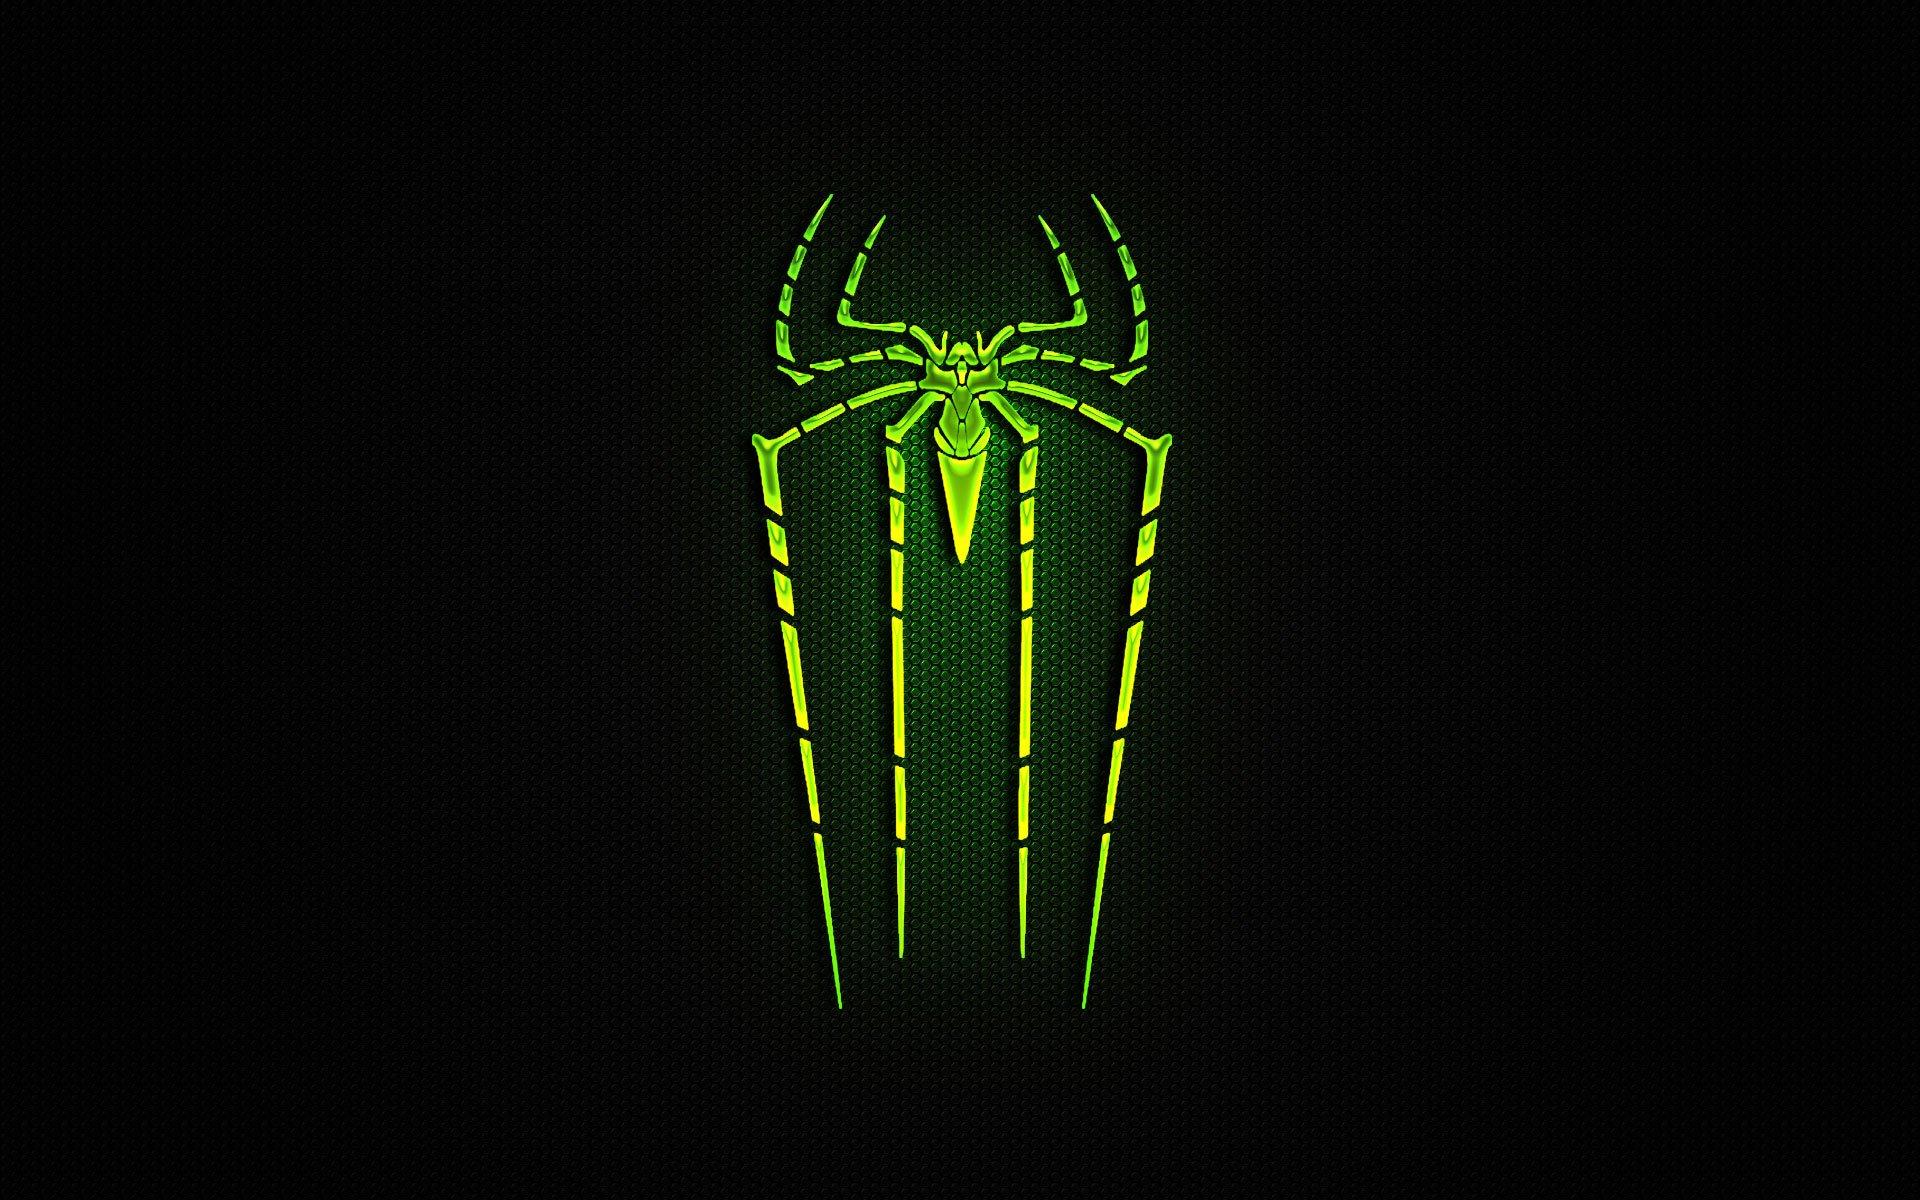 Hd spiderman logo wallpaper wallpapersafari - Wallpapers sites list ...